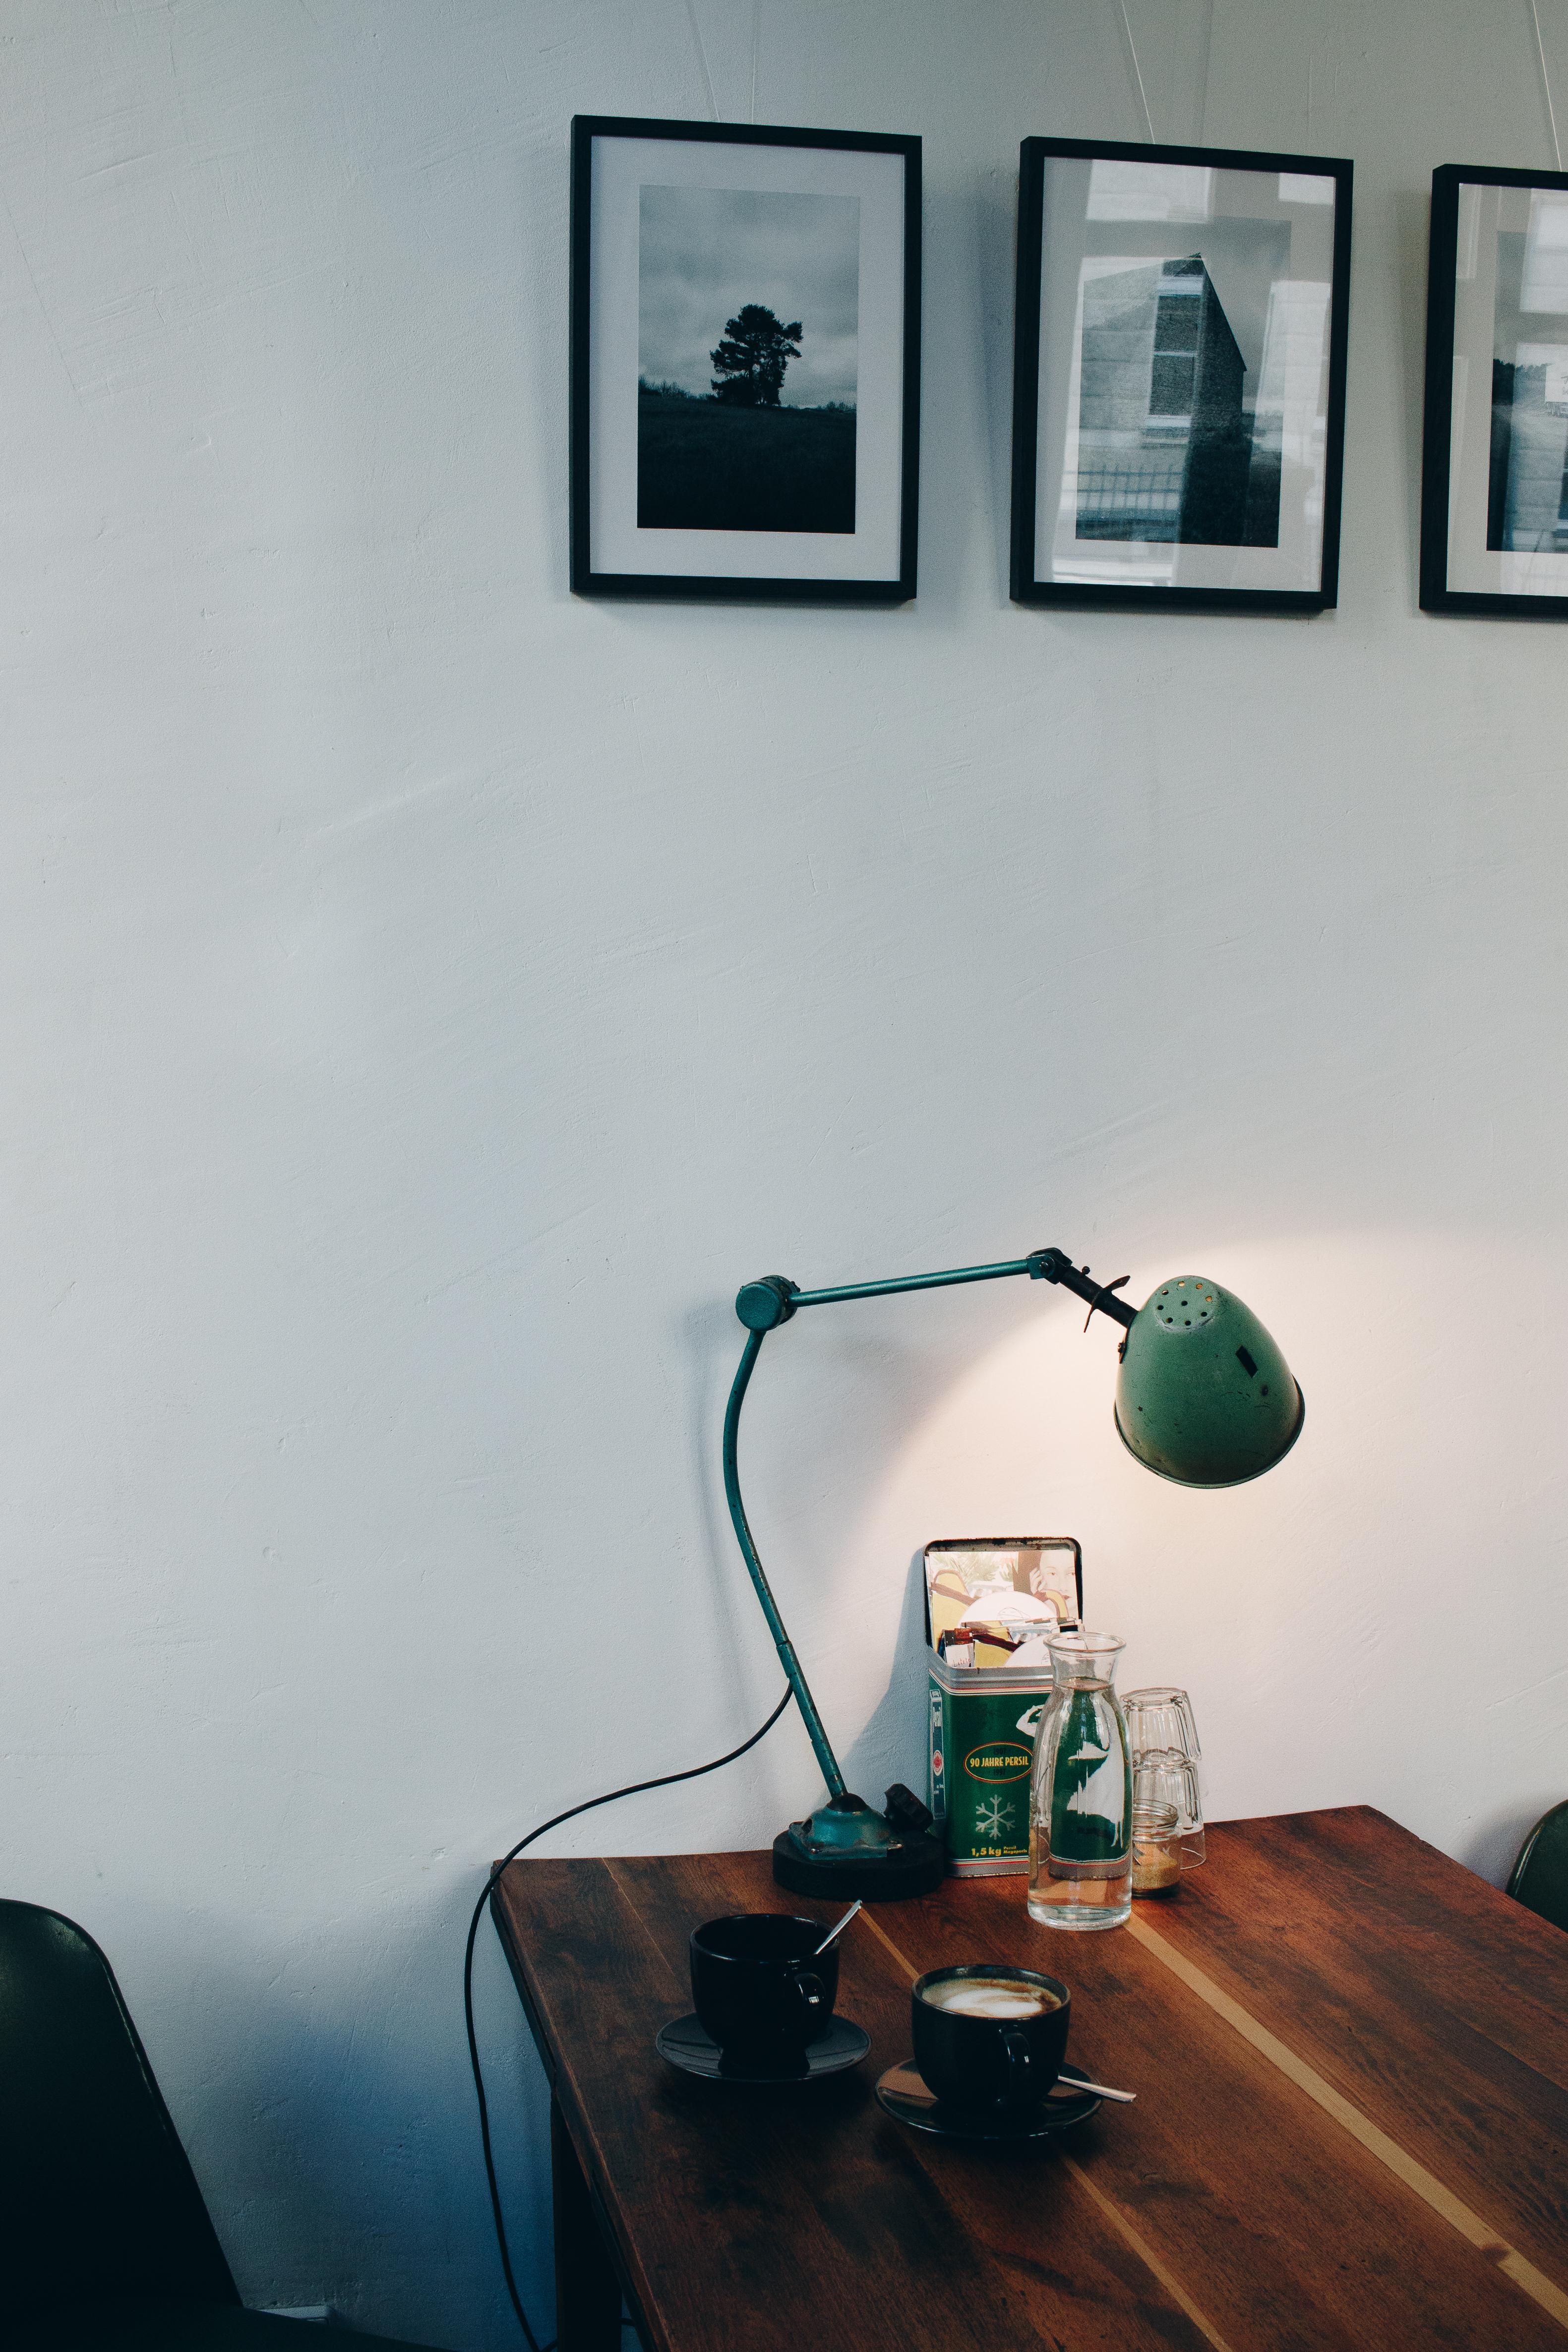 s1 vinyl&kaffee-leutzsch-leipzig-annabelle sagt9